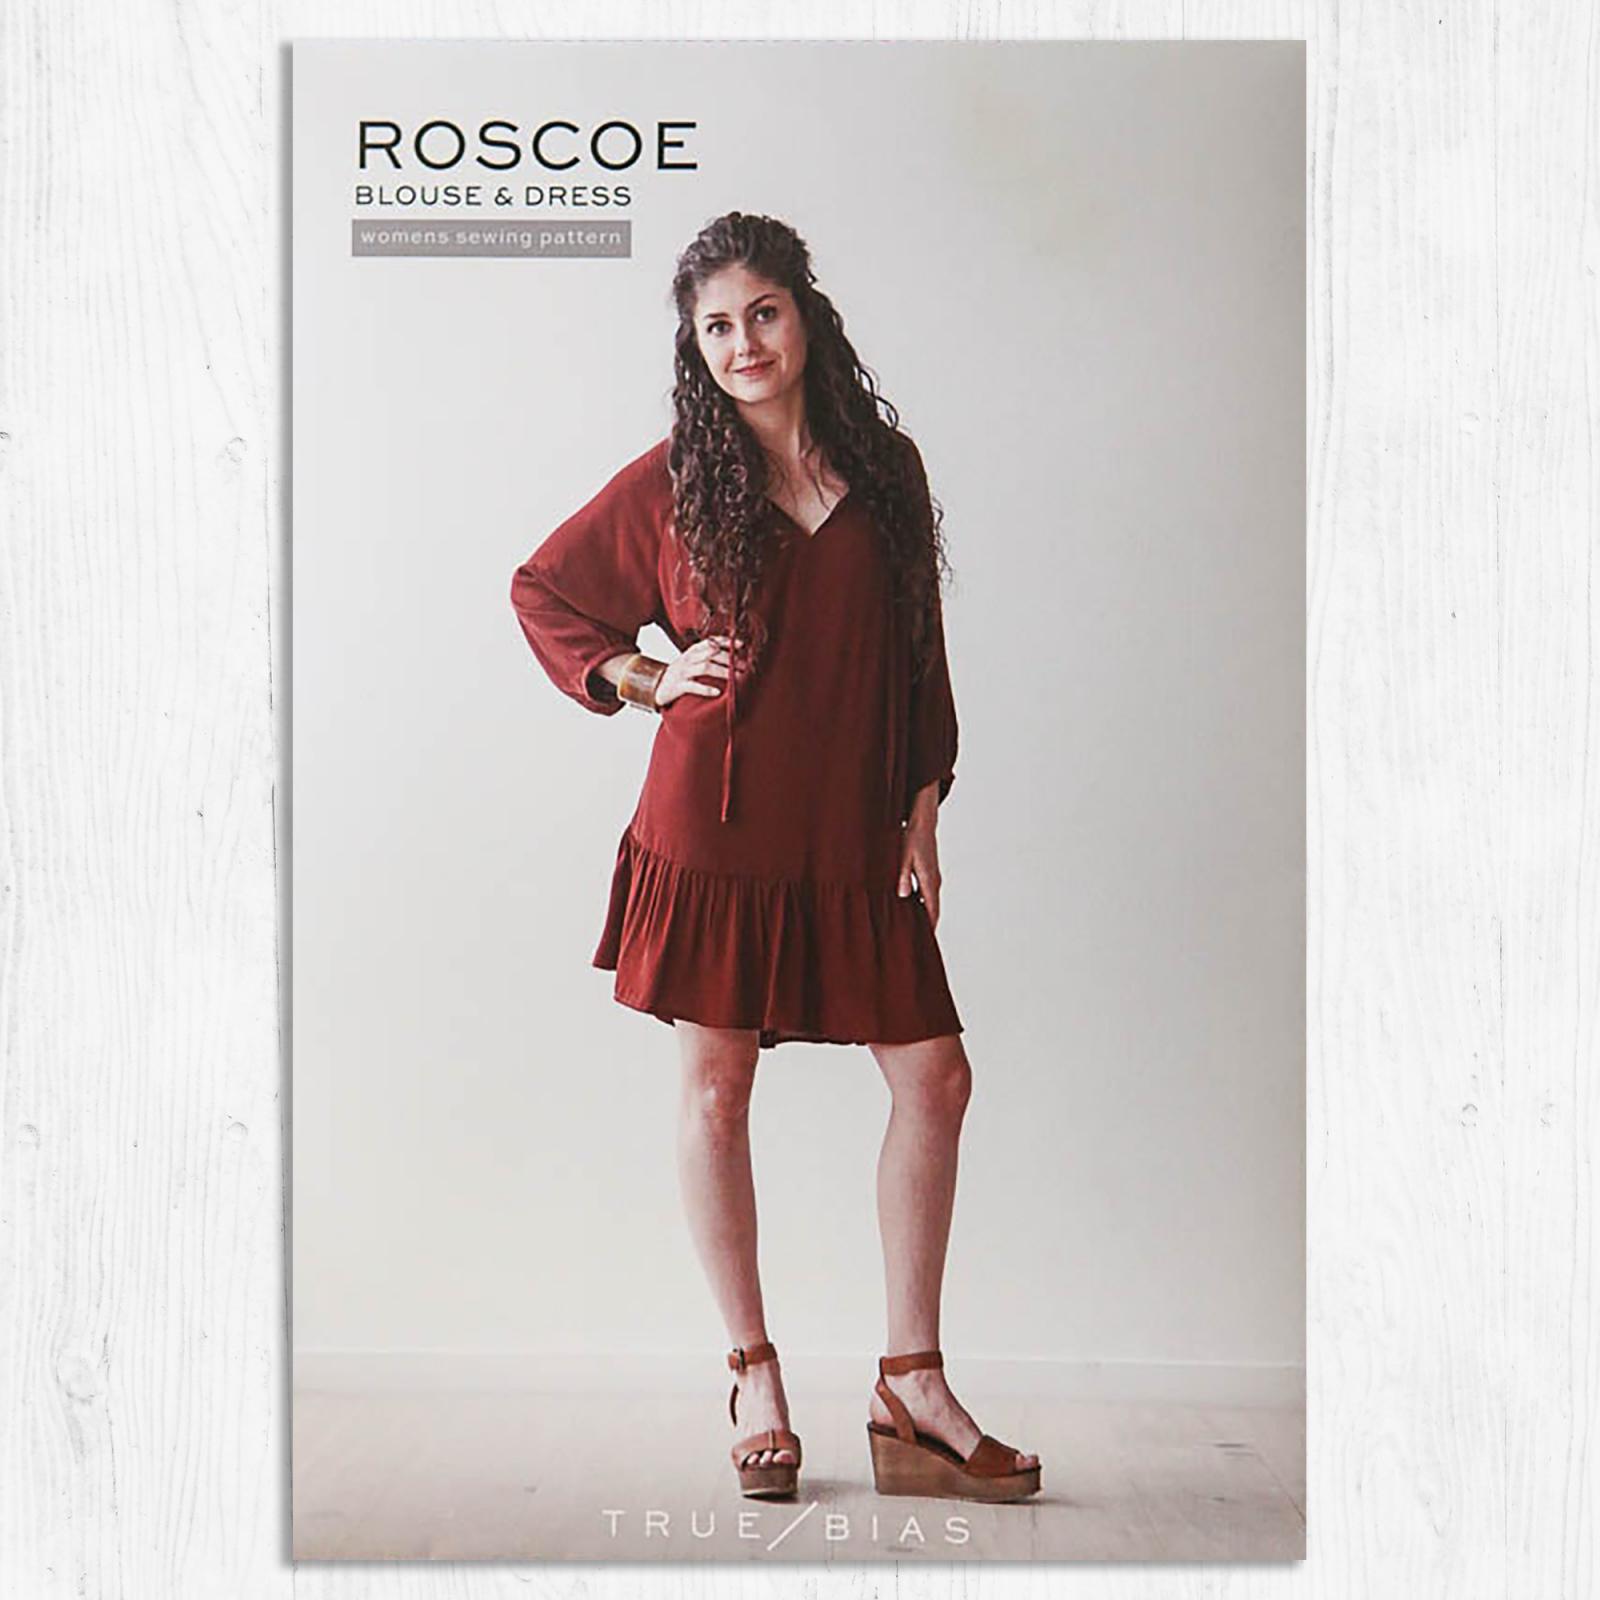 True Bias - Roscoe Dress + Blouse